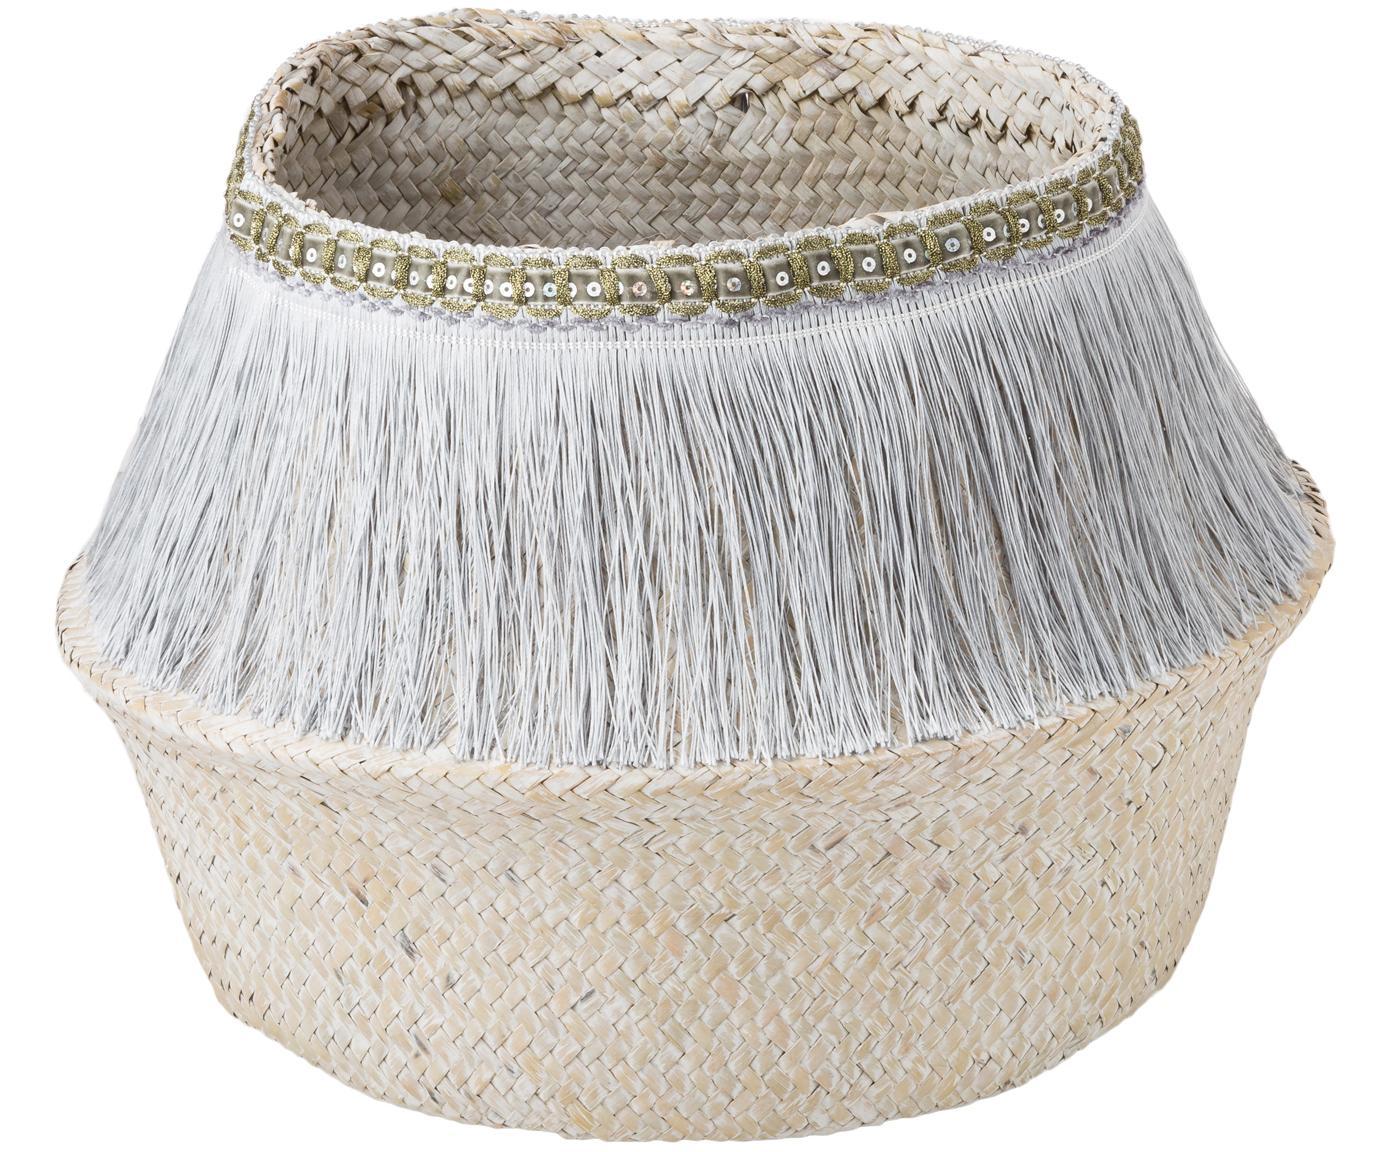 Handgefertigter Aufbewahrungskorb Frans, Korb: Seegras, Fransen: Polyester, Silberfarben, Weiss, Ø 35 x H 25 cm